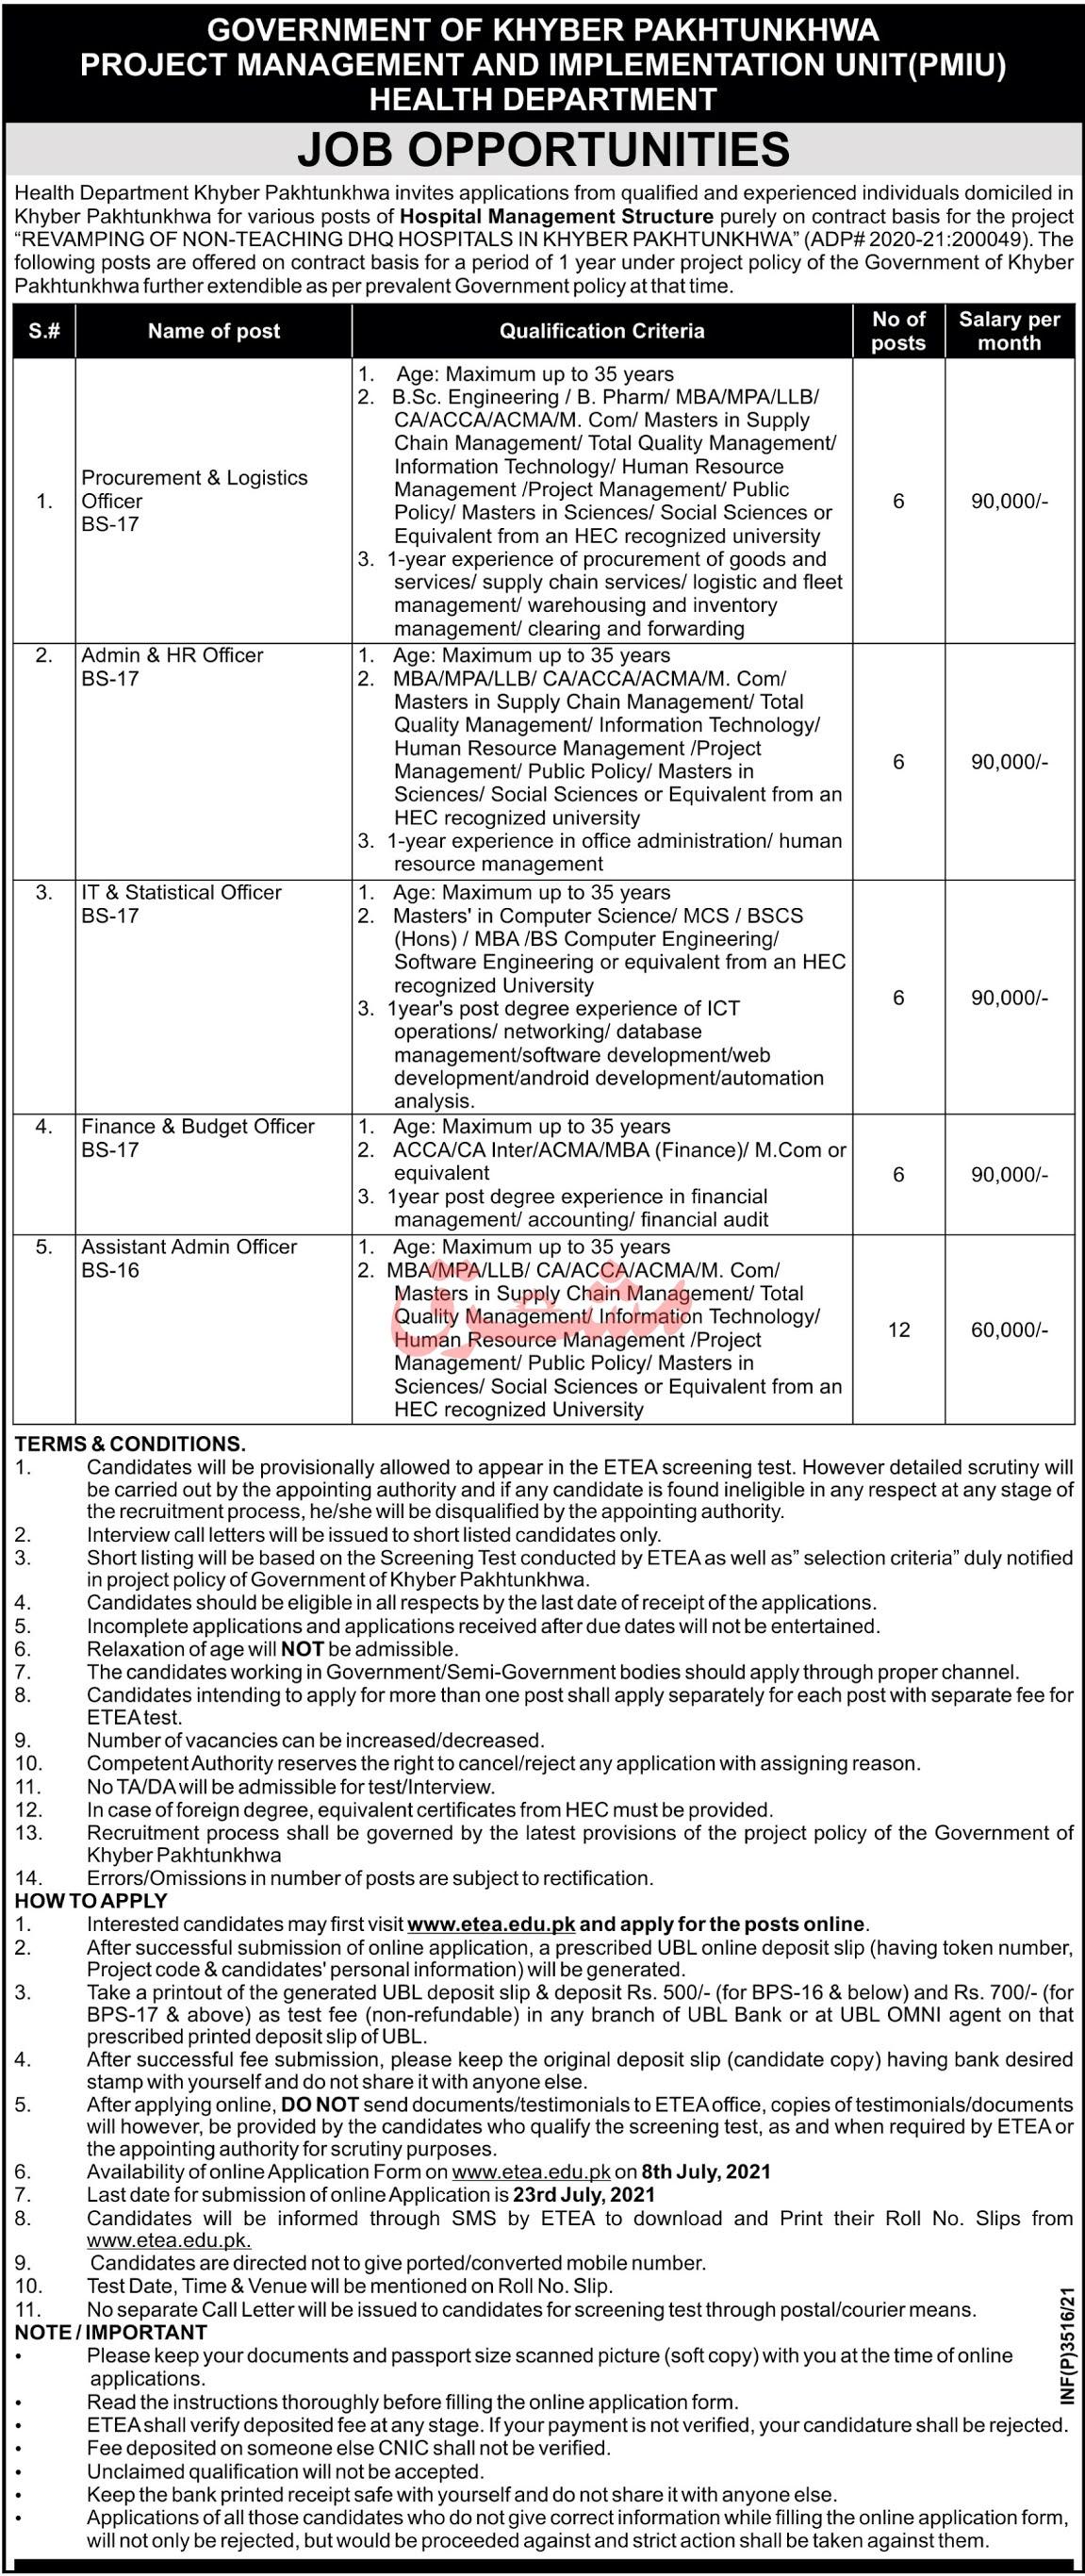 KPK Health Department Jobs 2021 in Pakistan - www.etea.edu.pk Jobs 2021